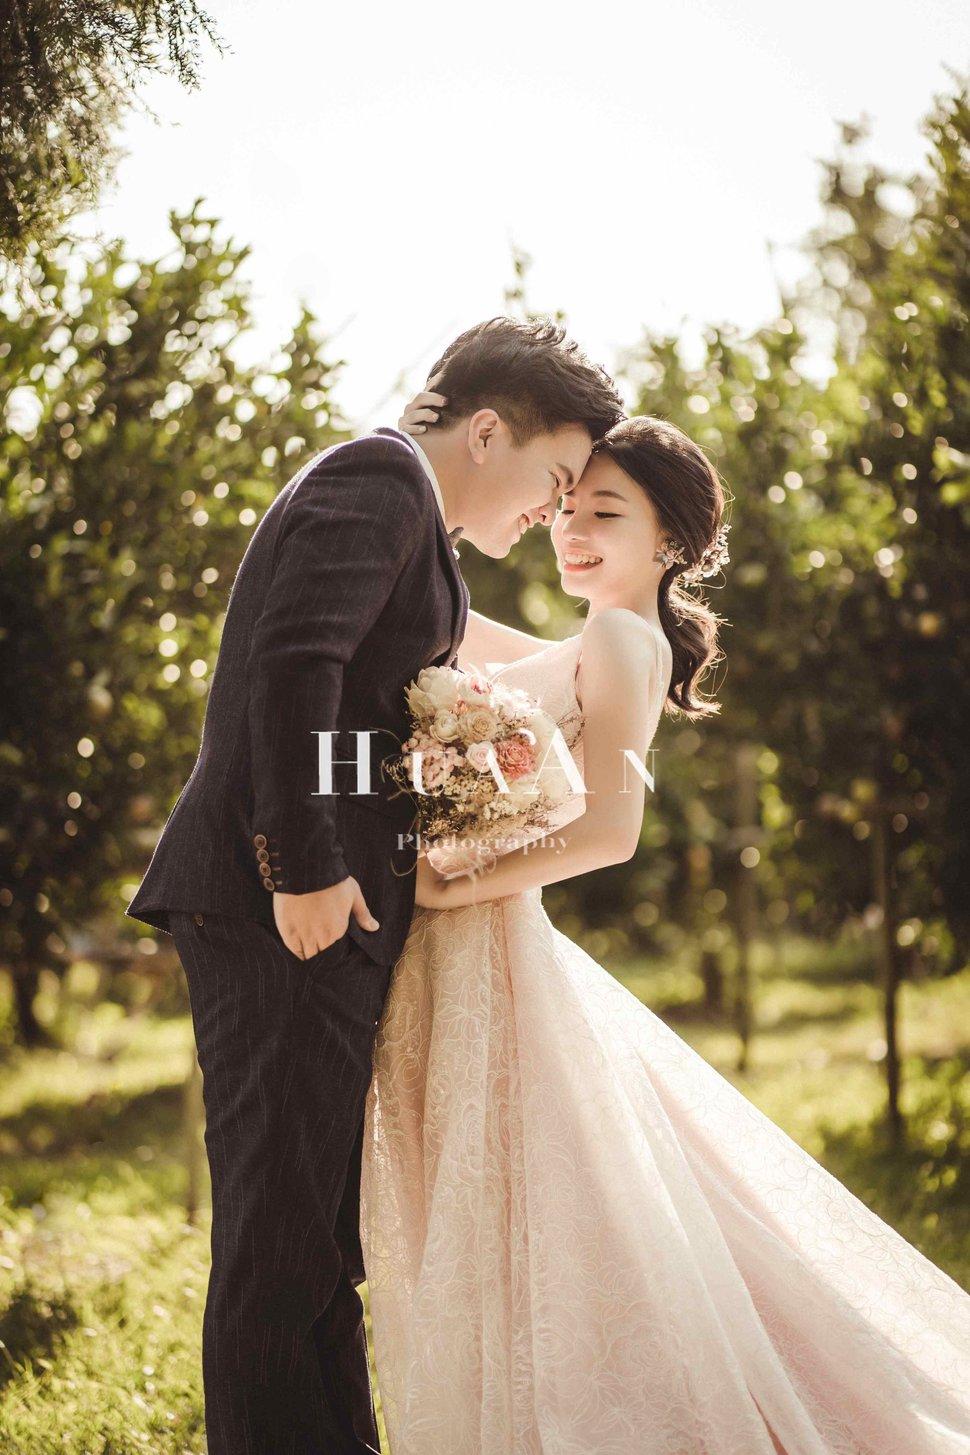 DSC04792 - Huaan Photography《結婚吧》